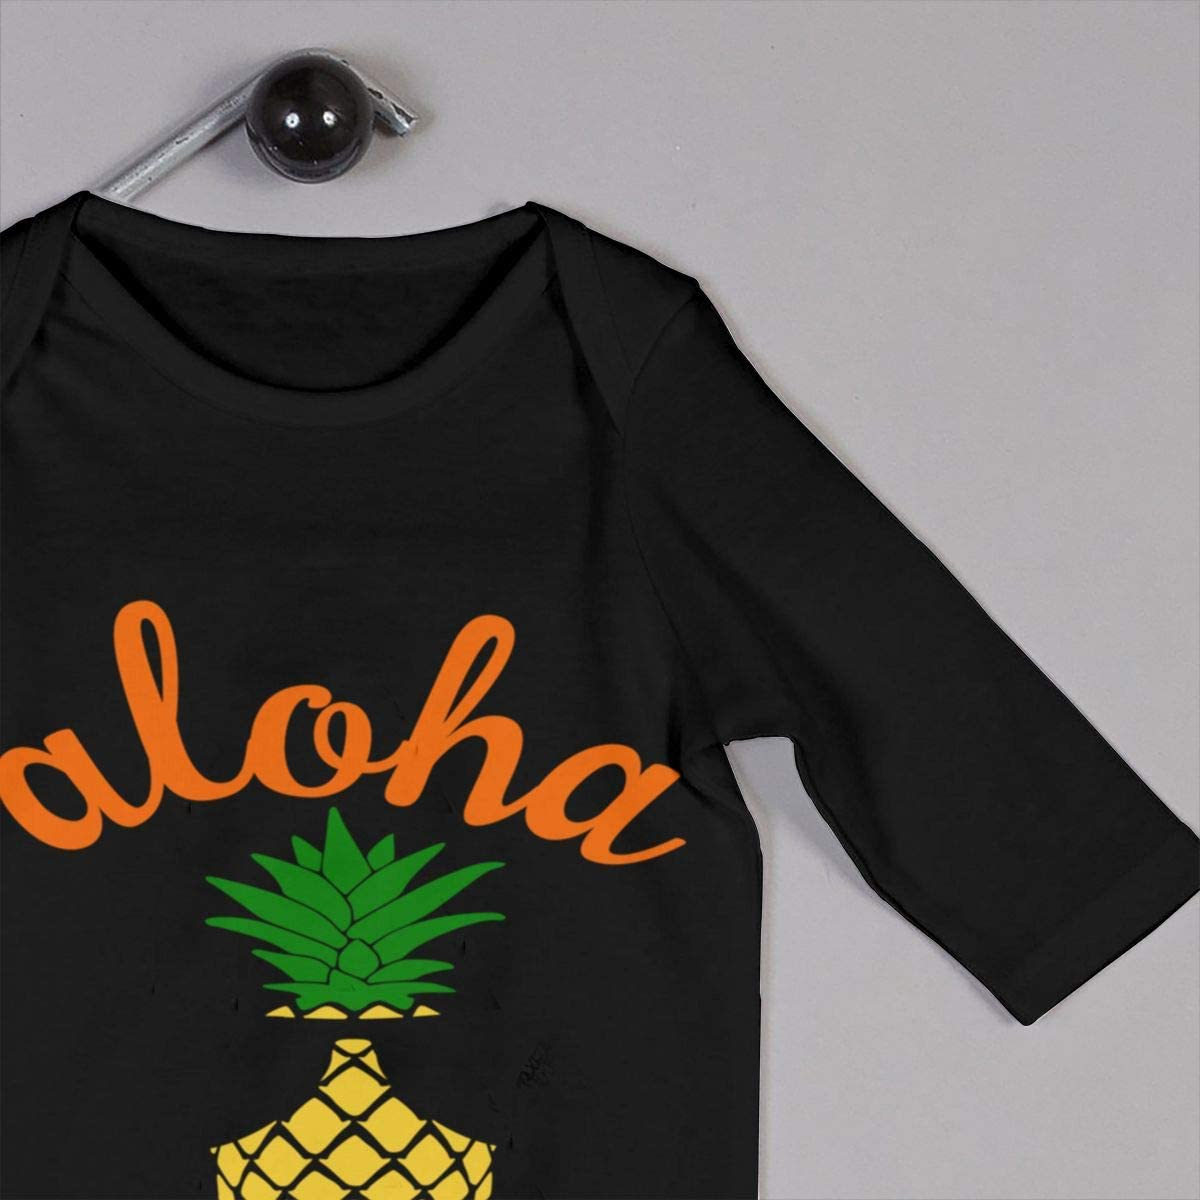 Aloha Beaches Pineapple Hawaii Printed Baby Boys Girls Jumpsuit Long Sleeve Romper Black